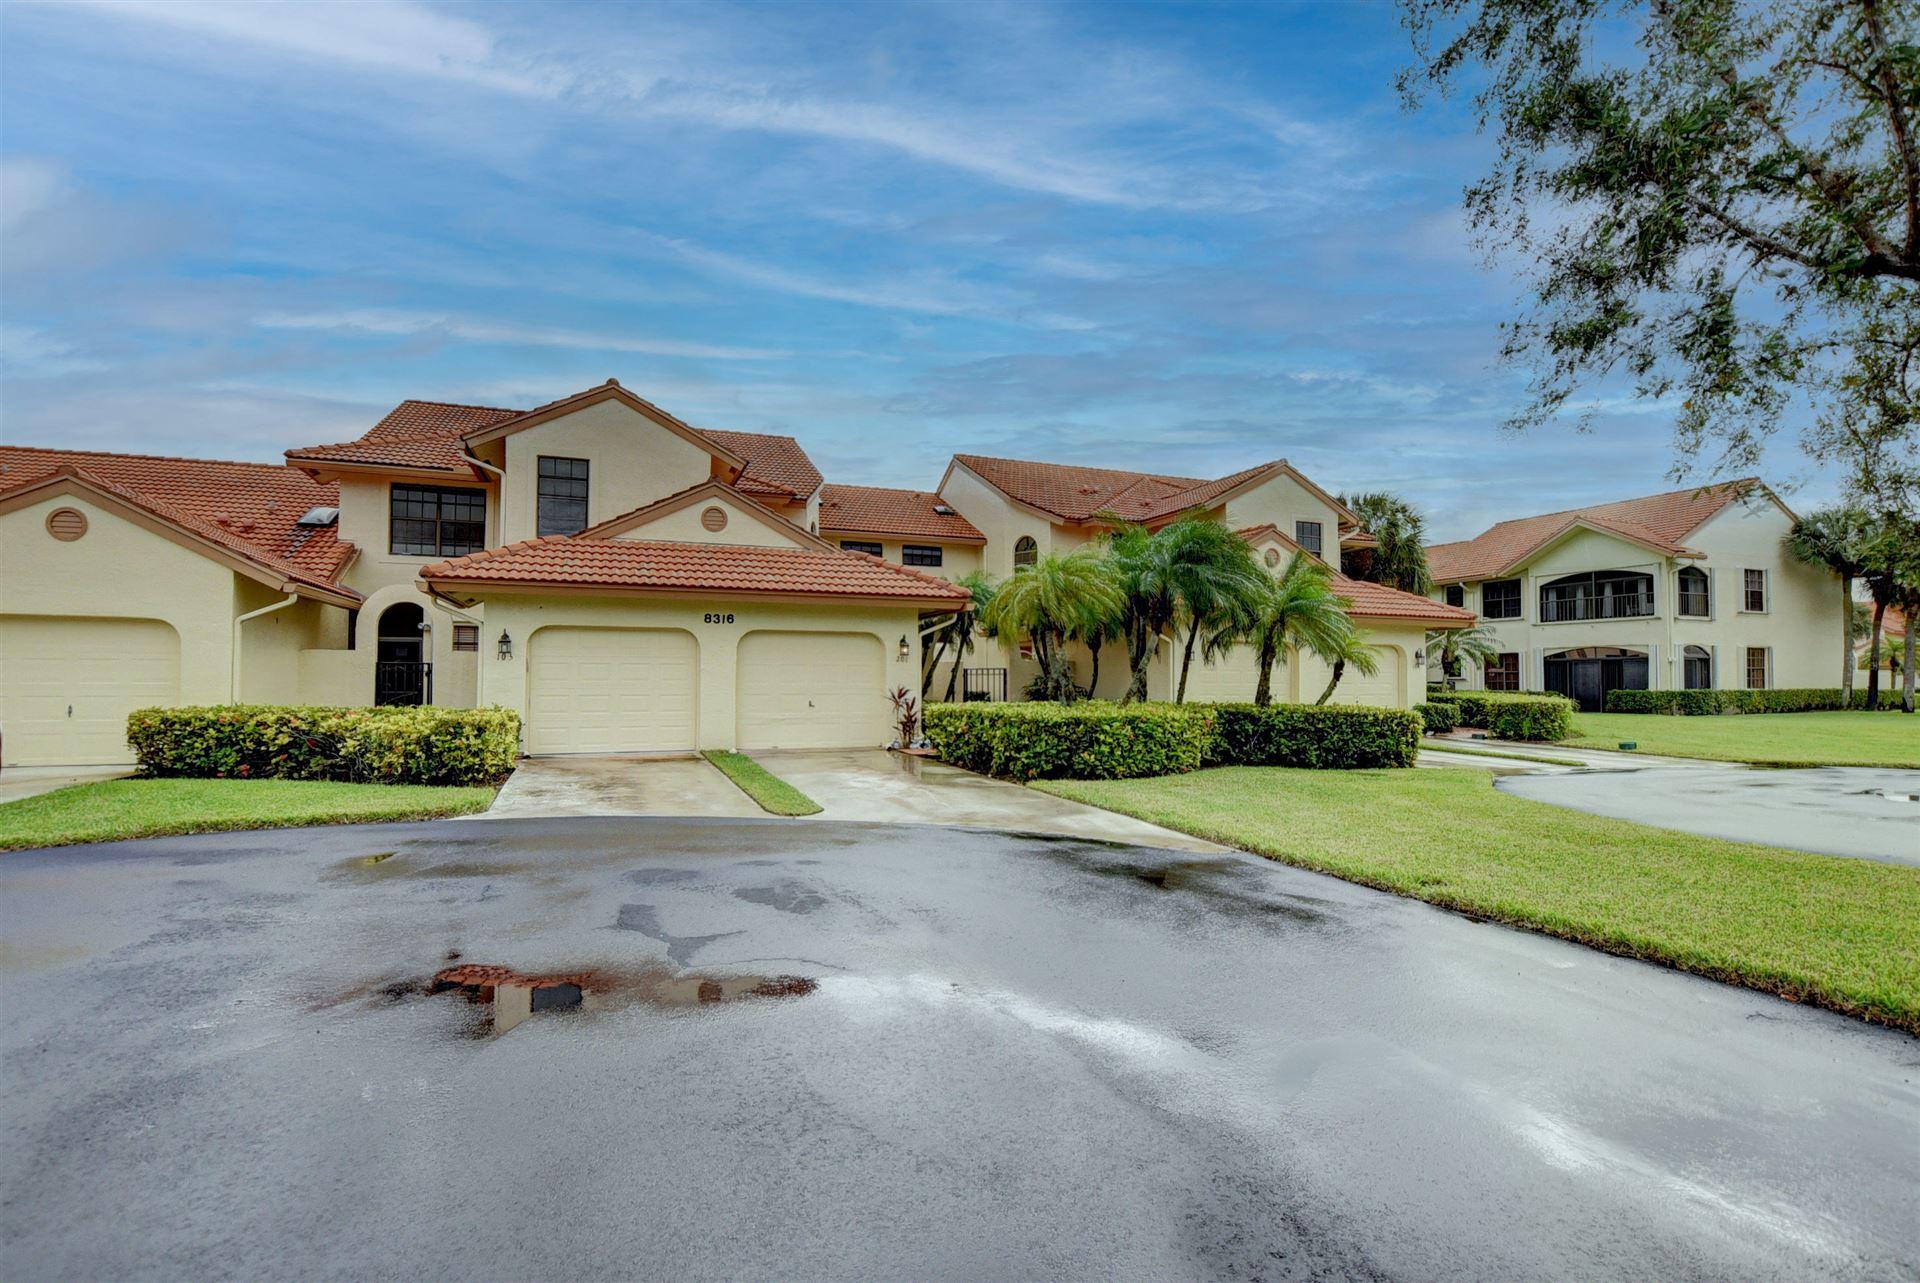 8316 Waterline Drive #201, Boynton Beach, FL 33472 - #: RX-10673130